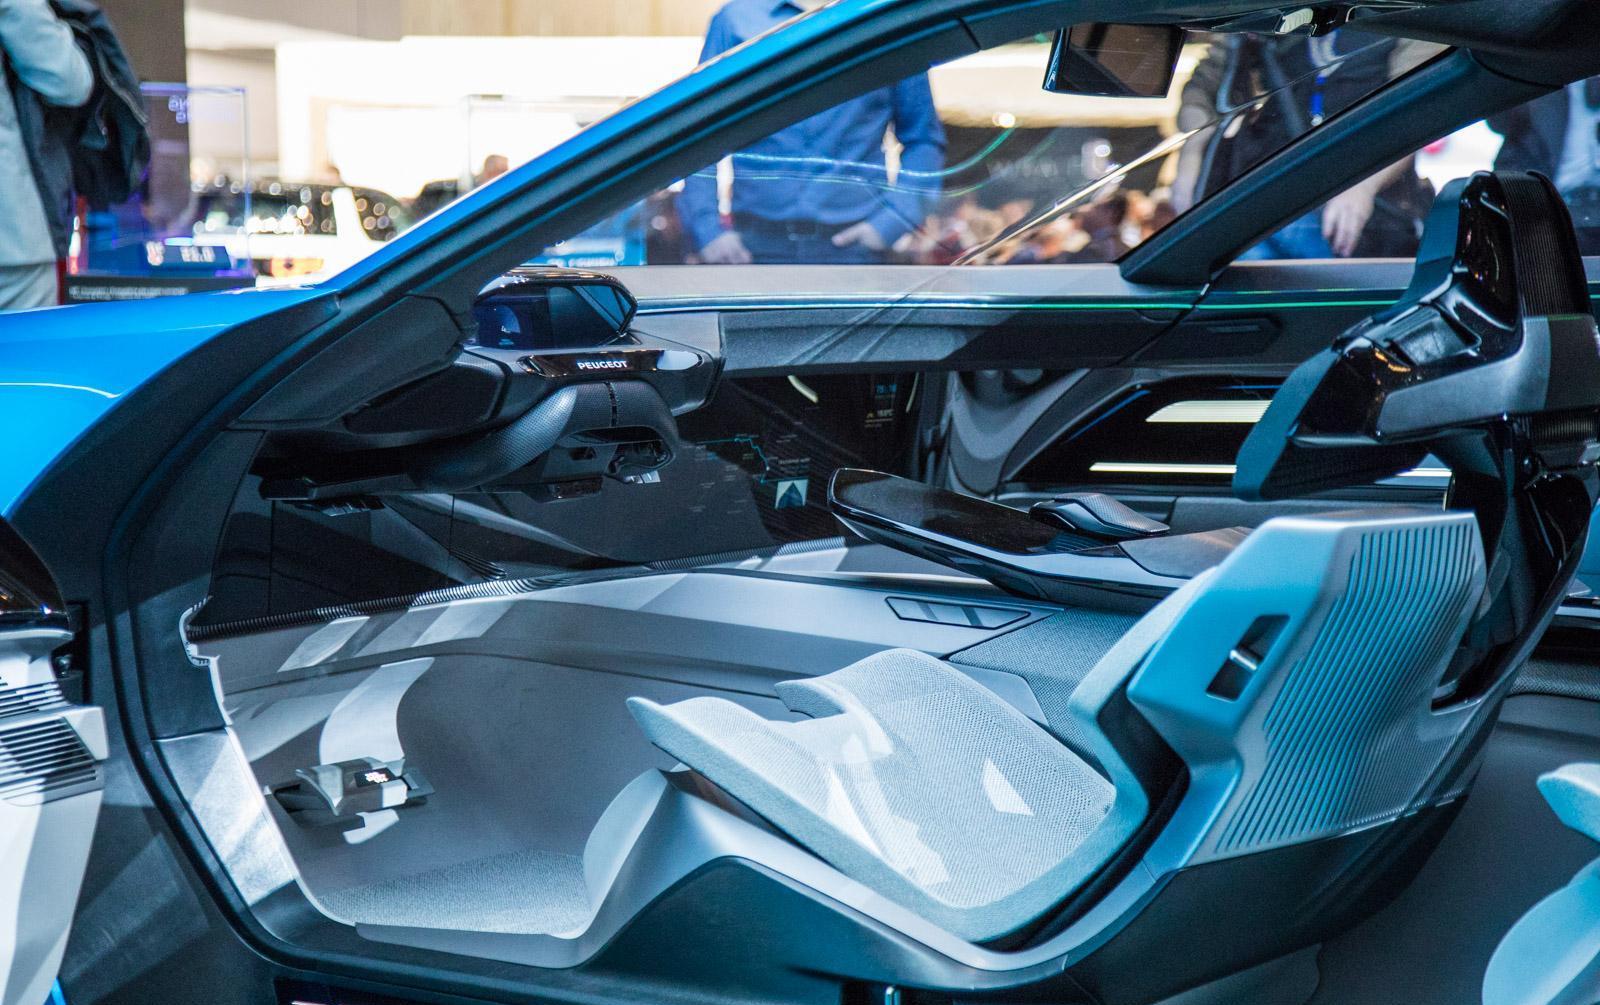 Peugeot-instinct-concept-010